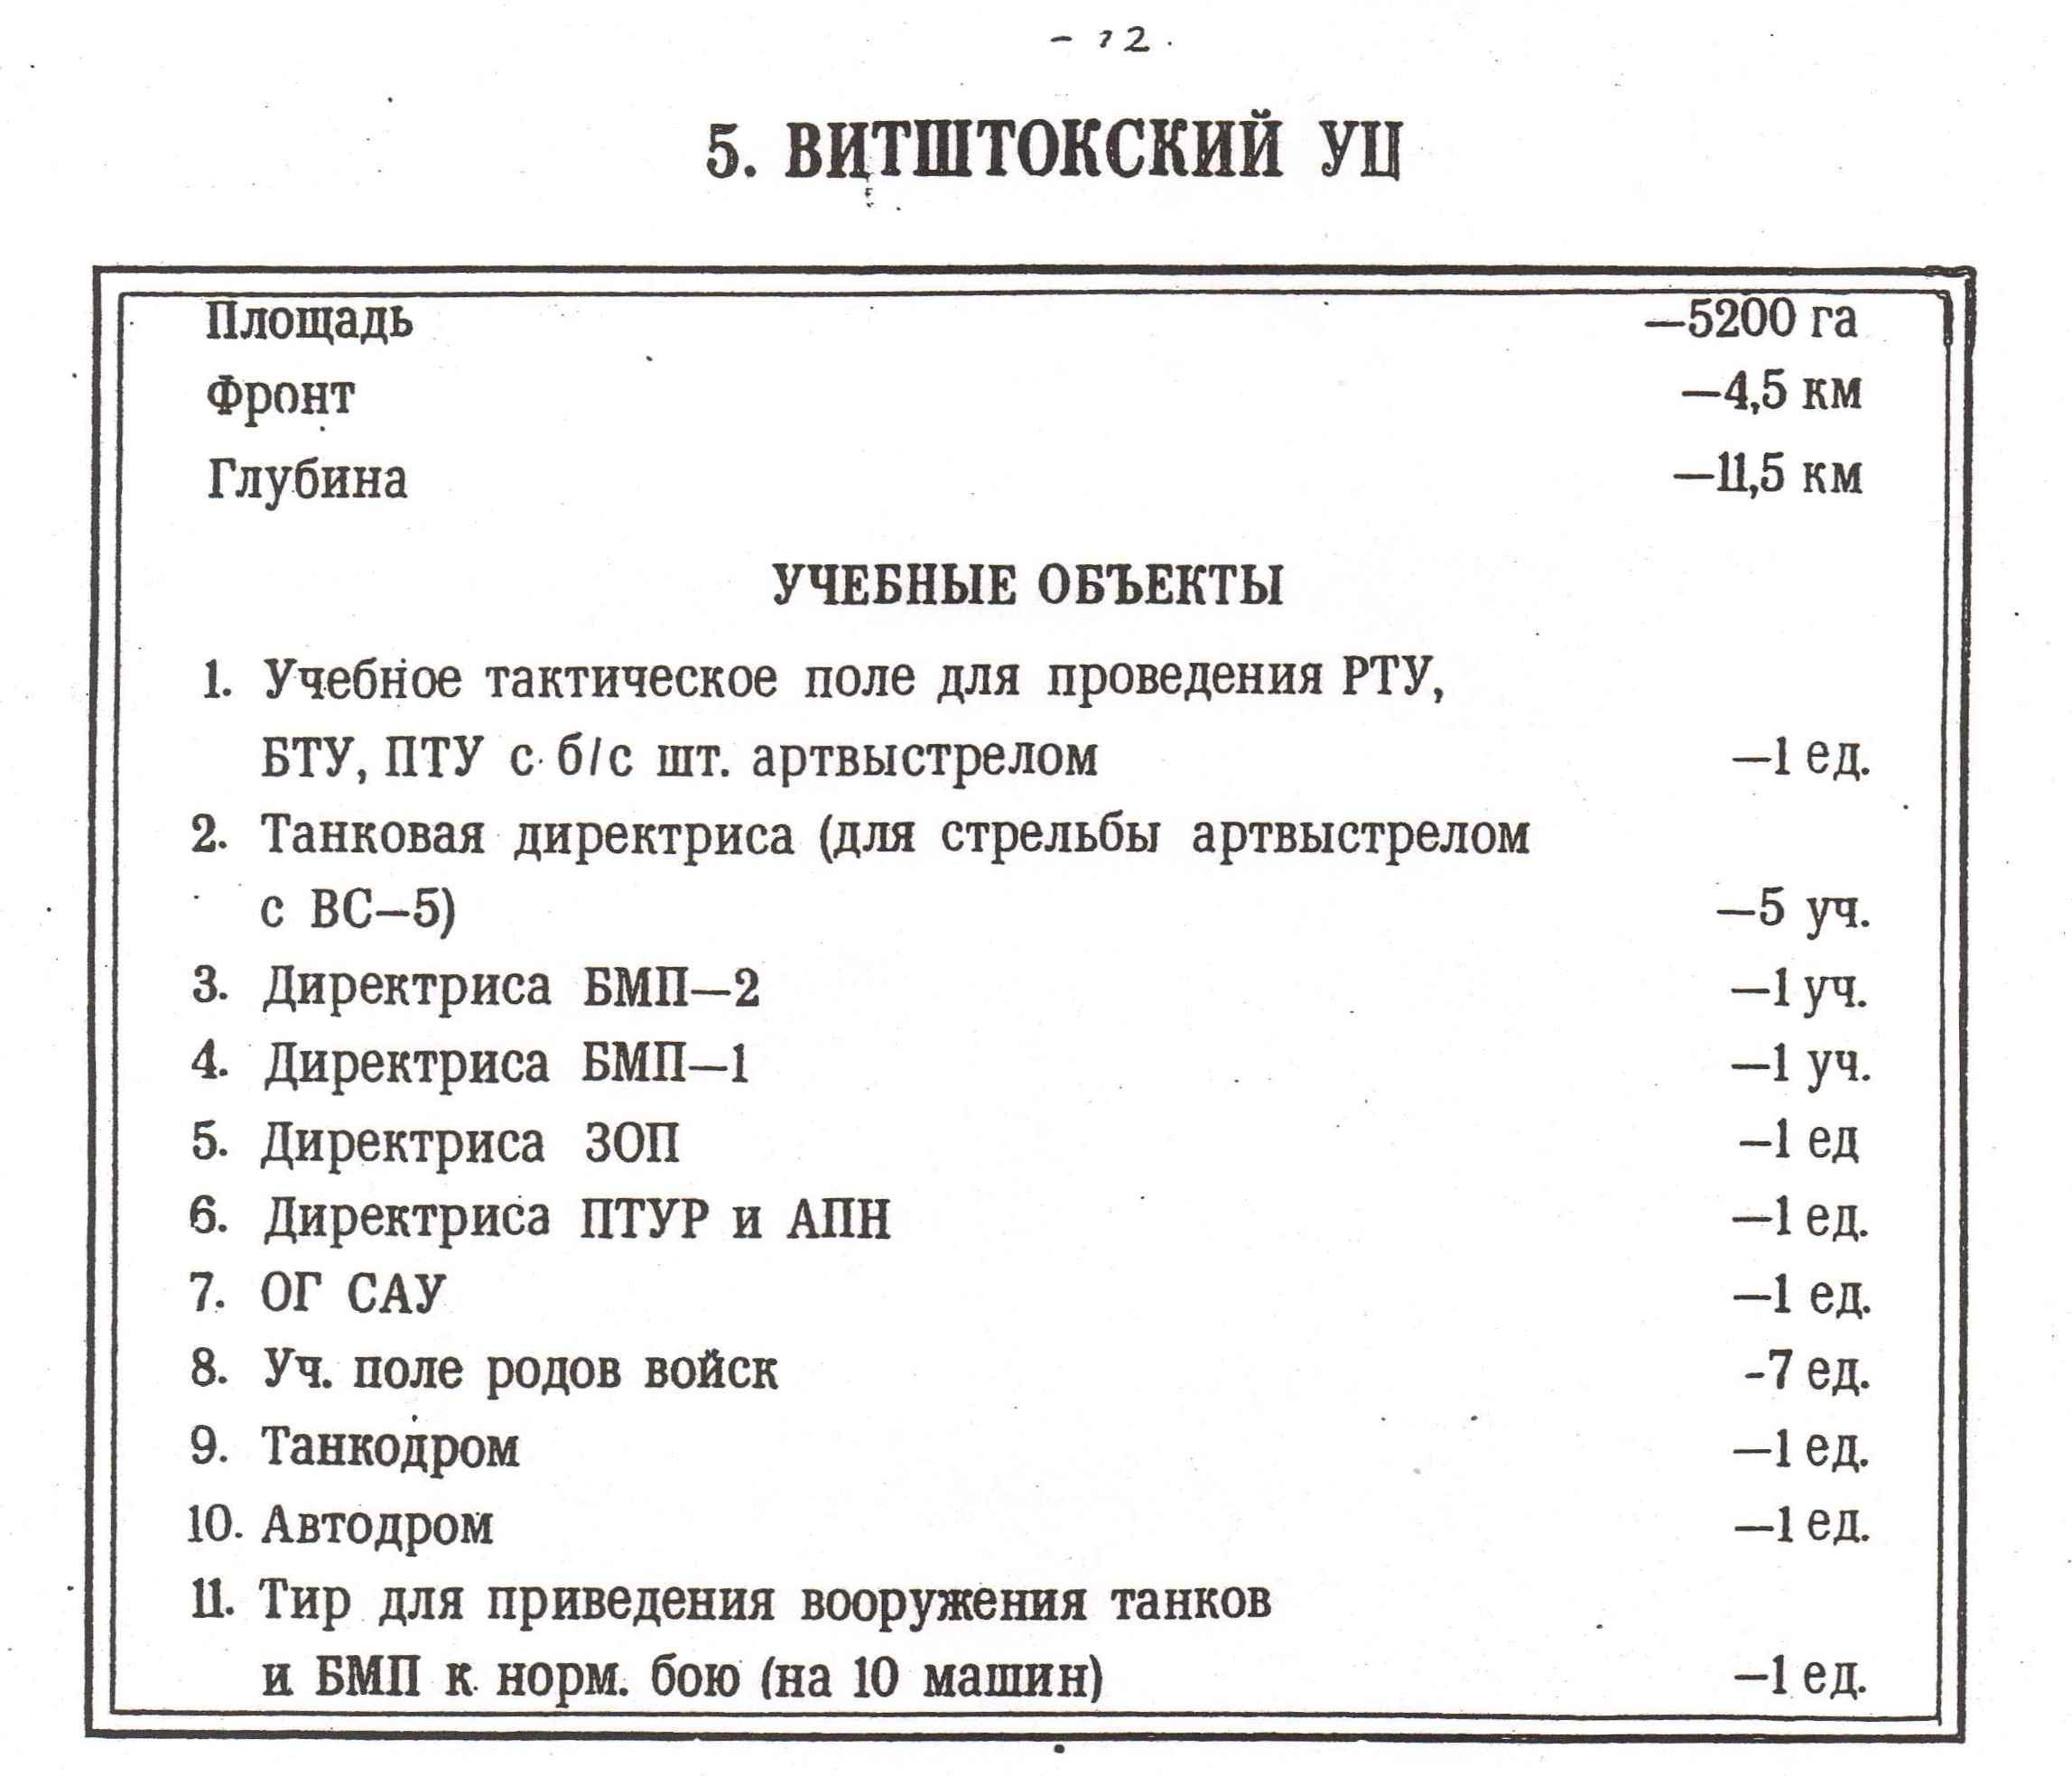 http://s2.uploads.ru/bUWFH.jpg